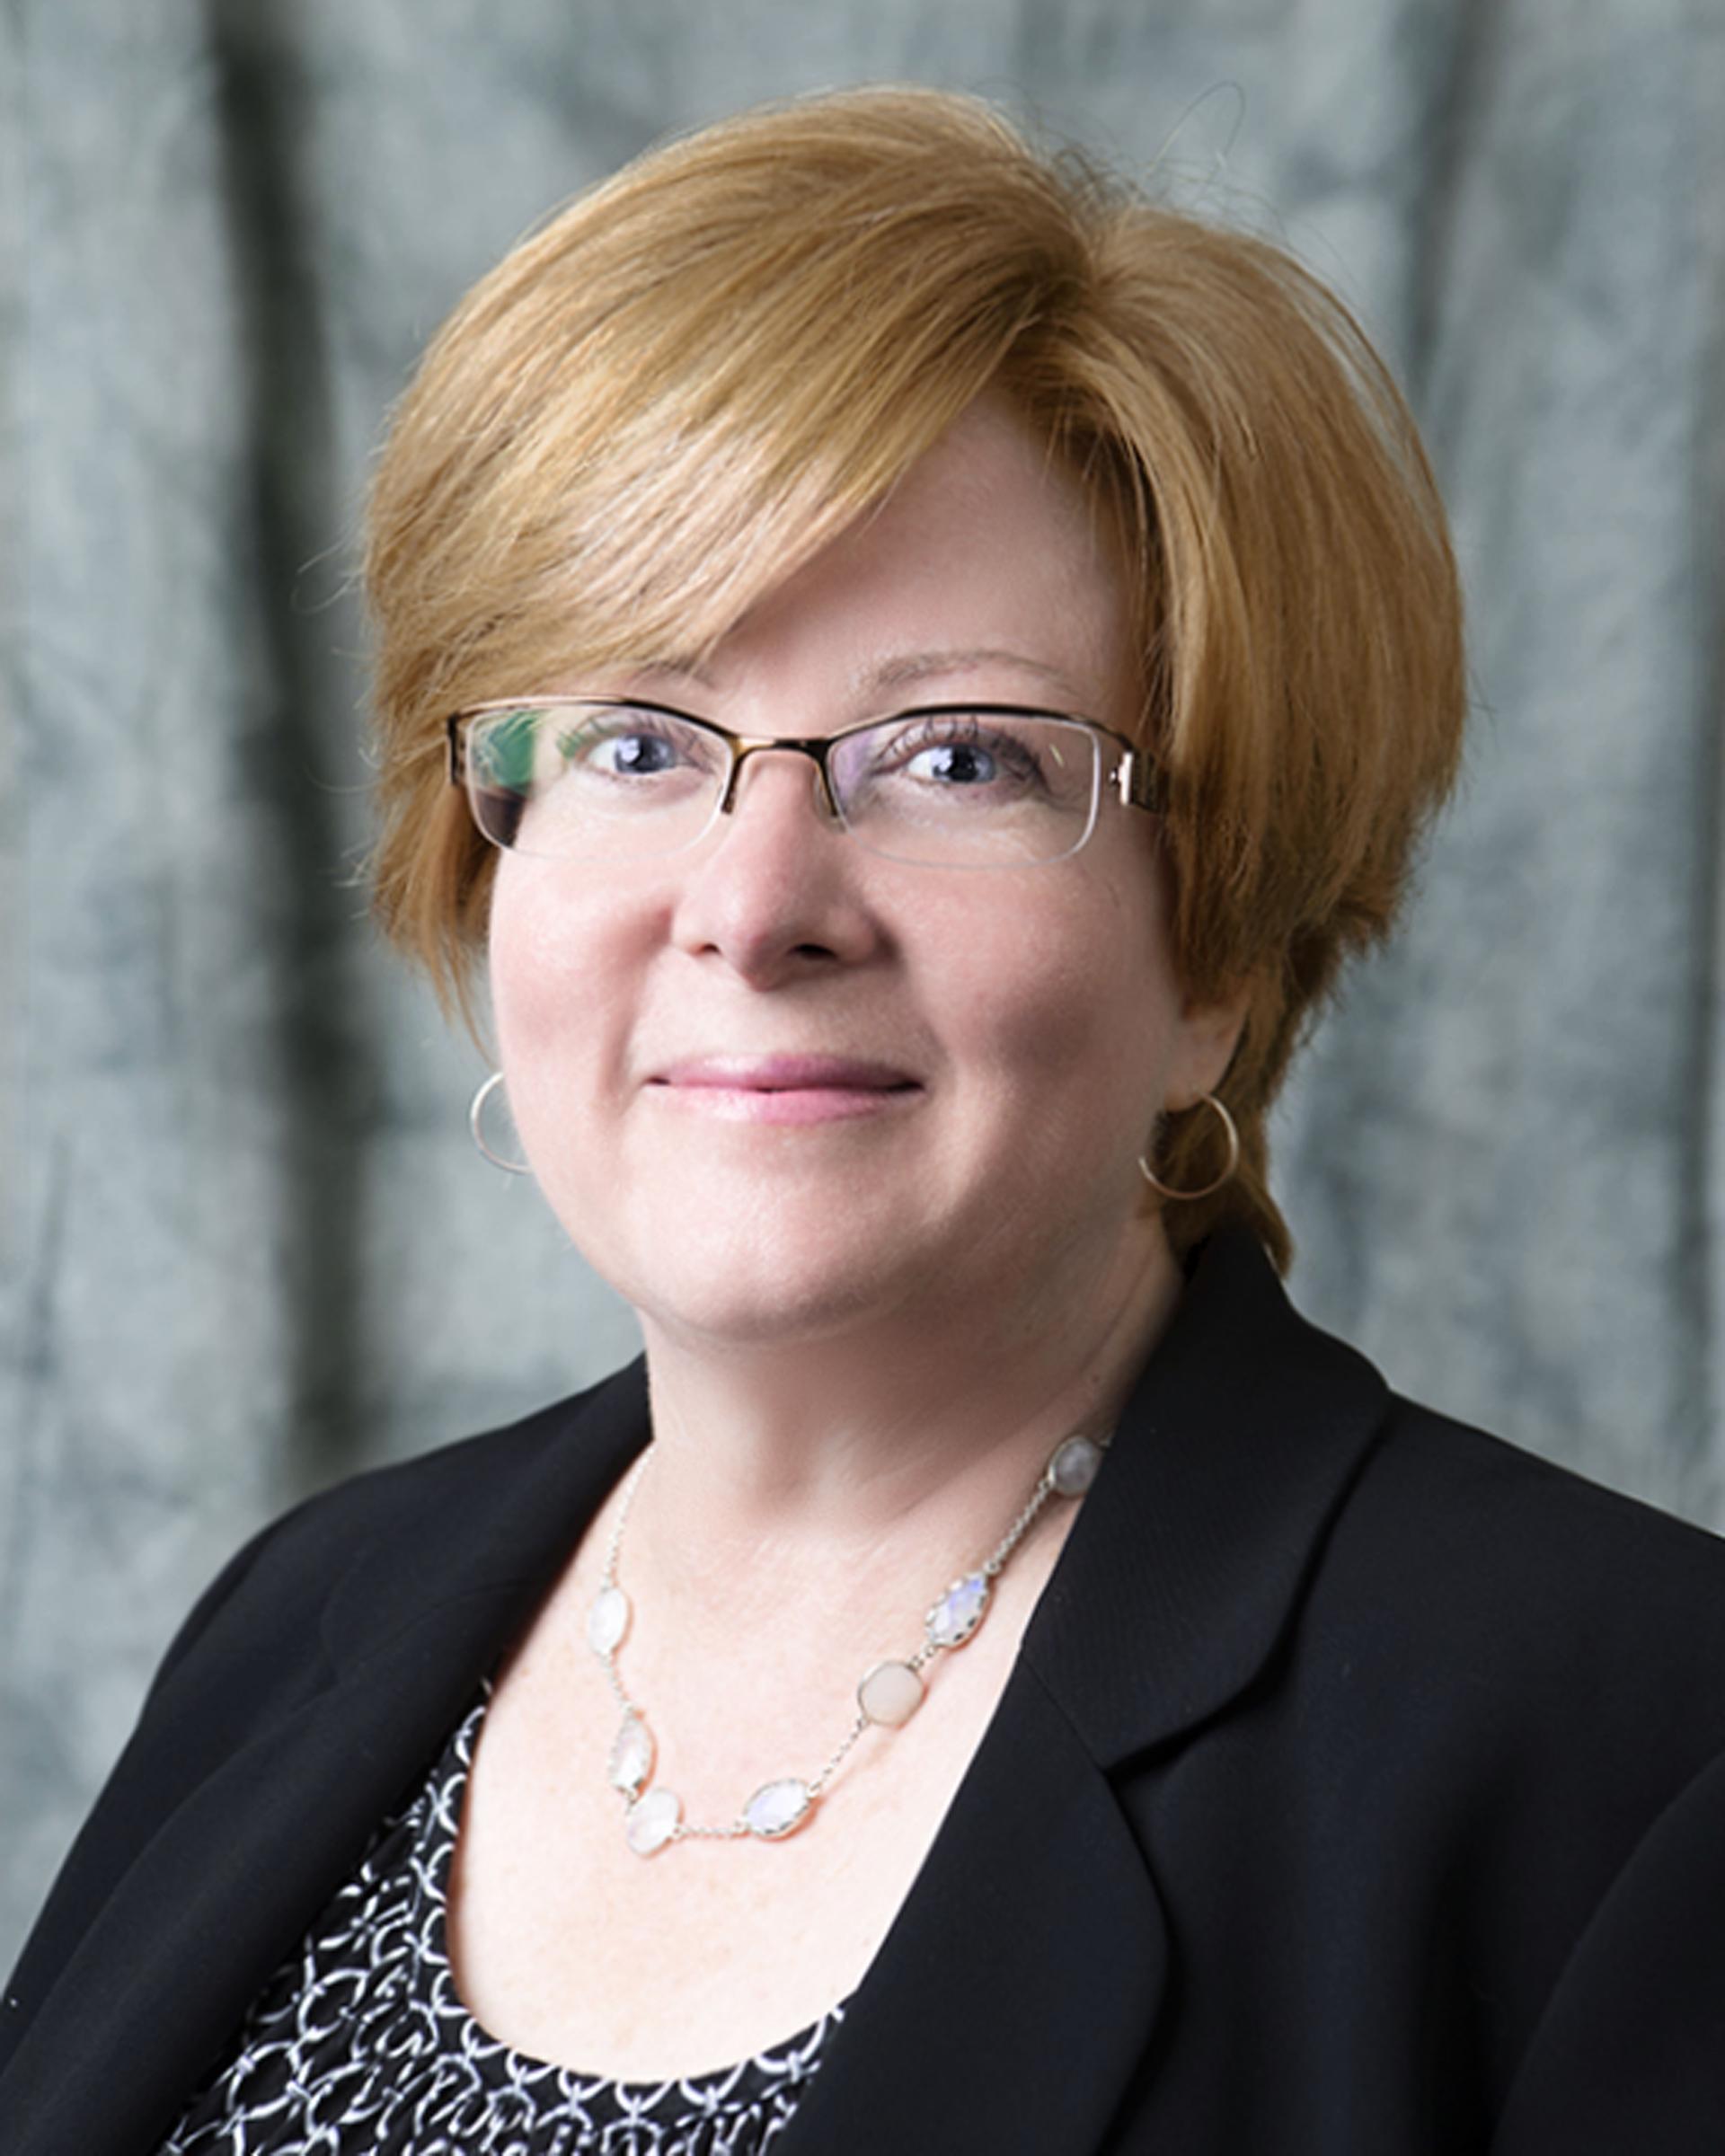 Annette Bettridge, PA-C, MS, FNP, assistant professor in the Physician Assistant Studies department